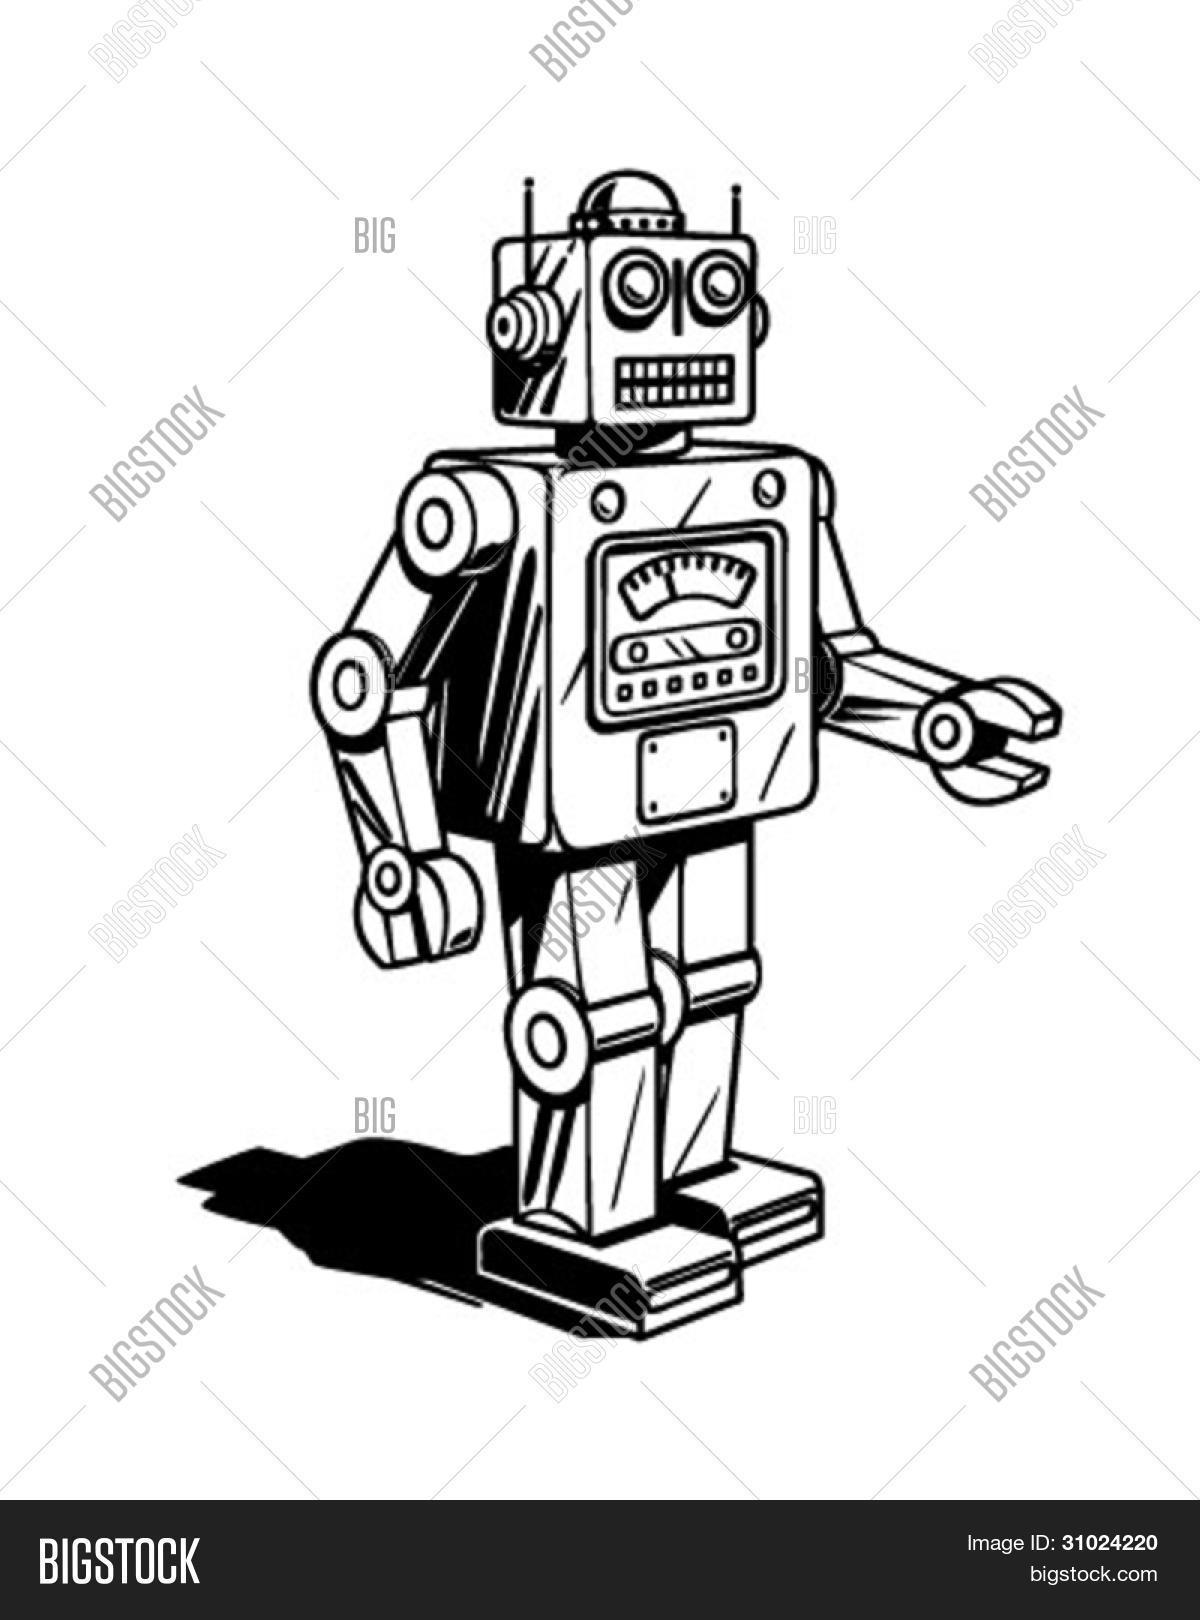 retro robot clipart illustration vector amp photo bigstock